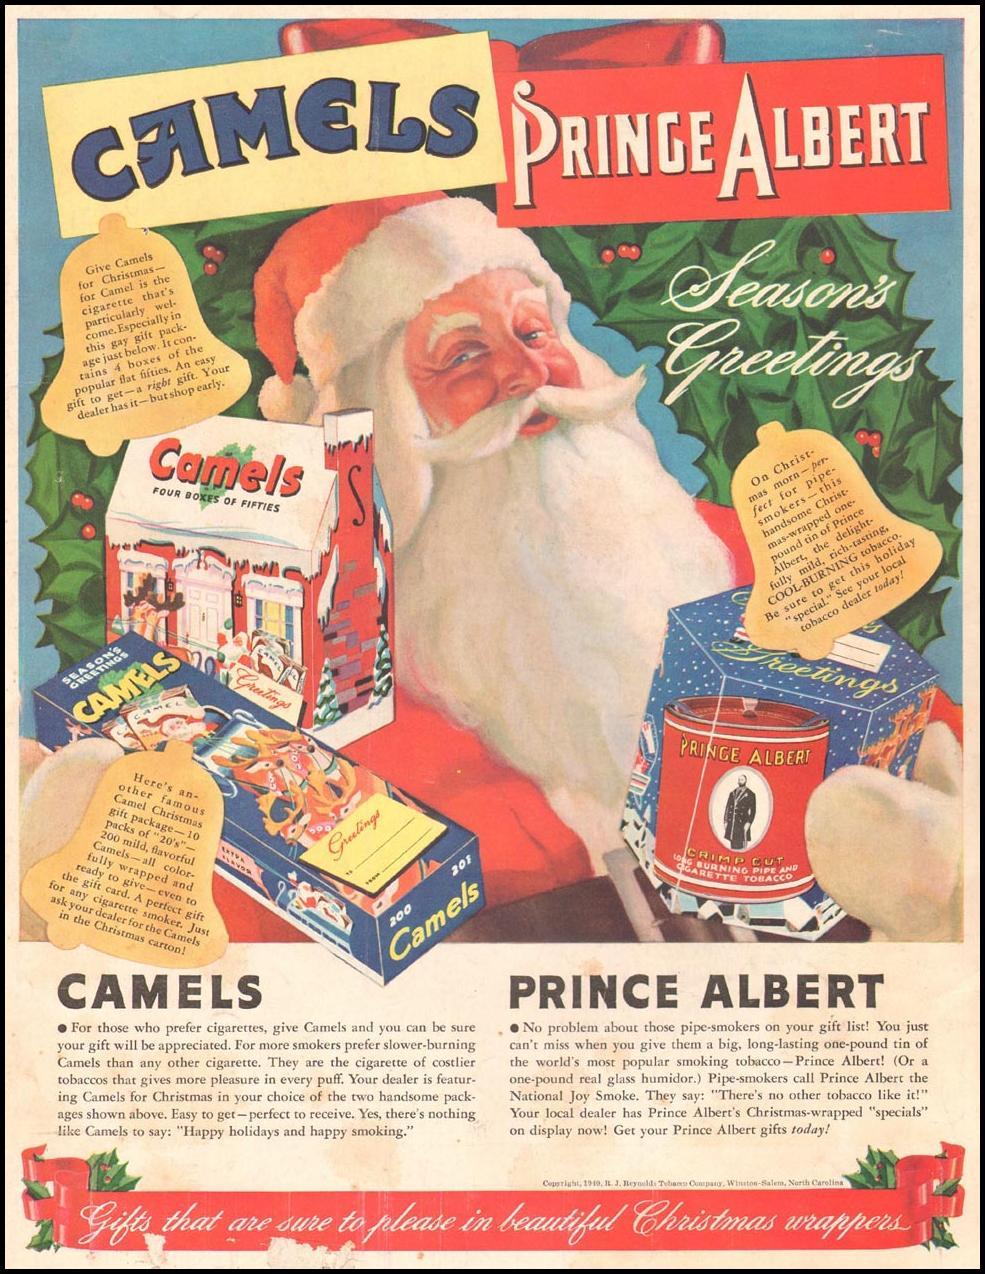 CAMEL CIGARETTES LIFE 12/16/1940 BACK COVER